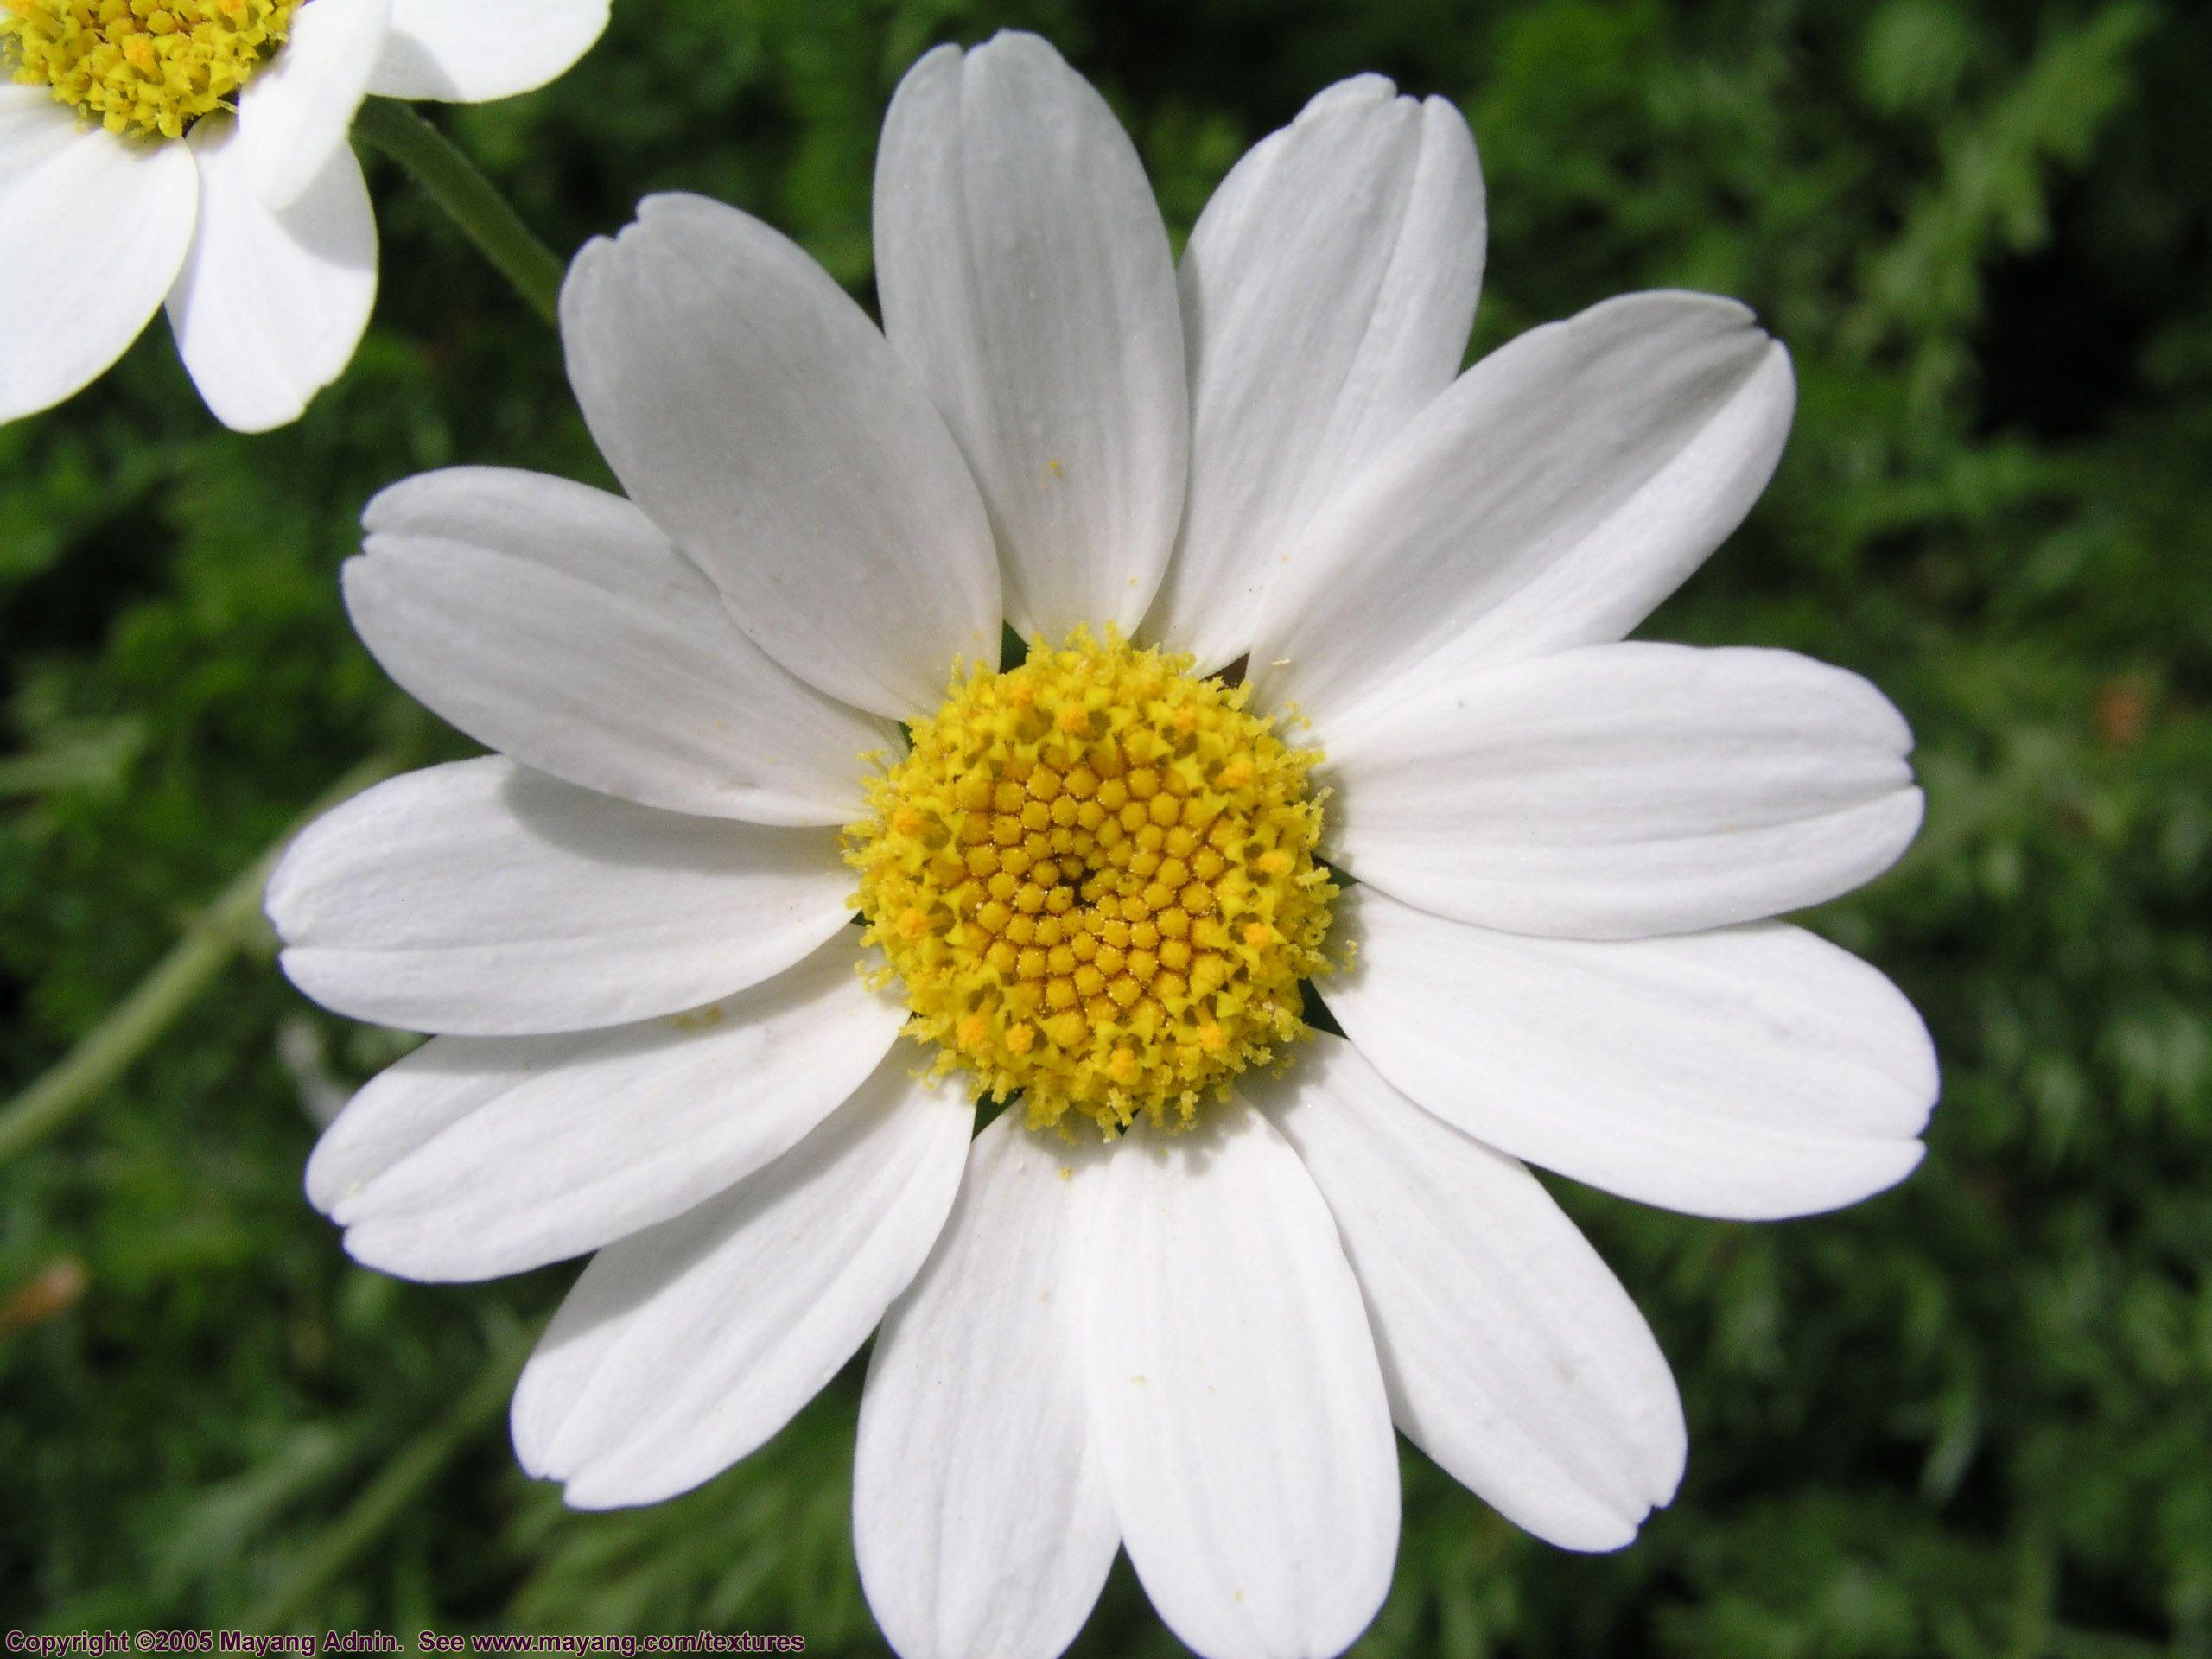 Daisylikeflower5140181g 25601920 flowers plants daisylikeflower5140181g 25601920 daisy izmirmasajfo Image collections